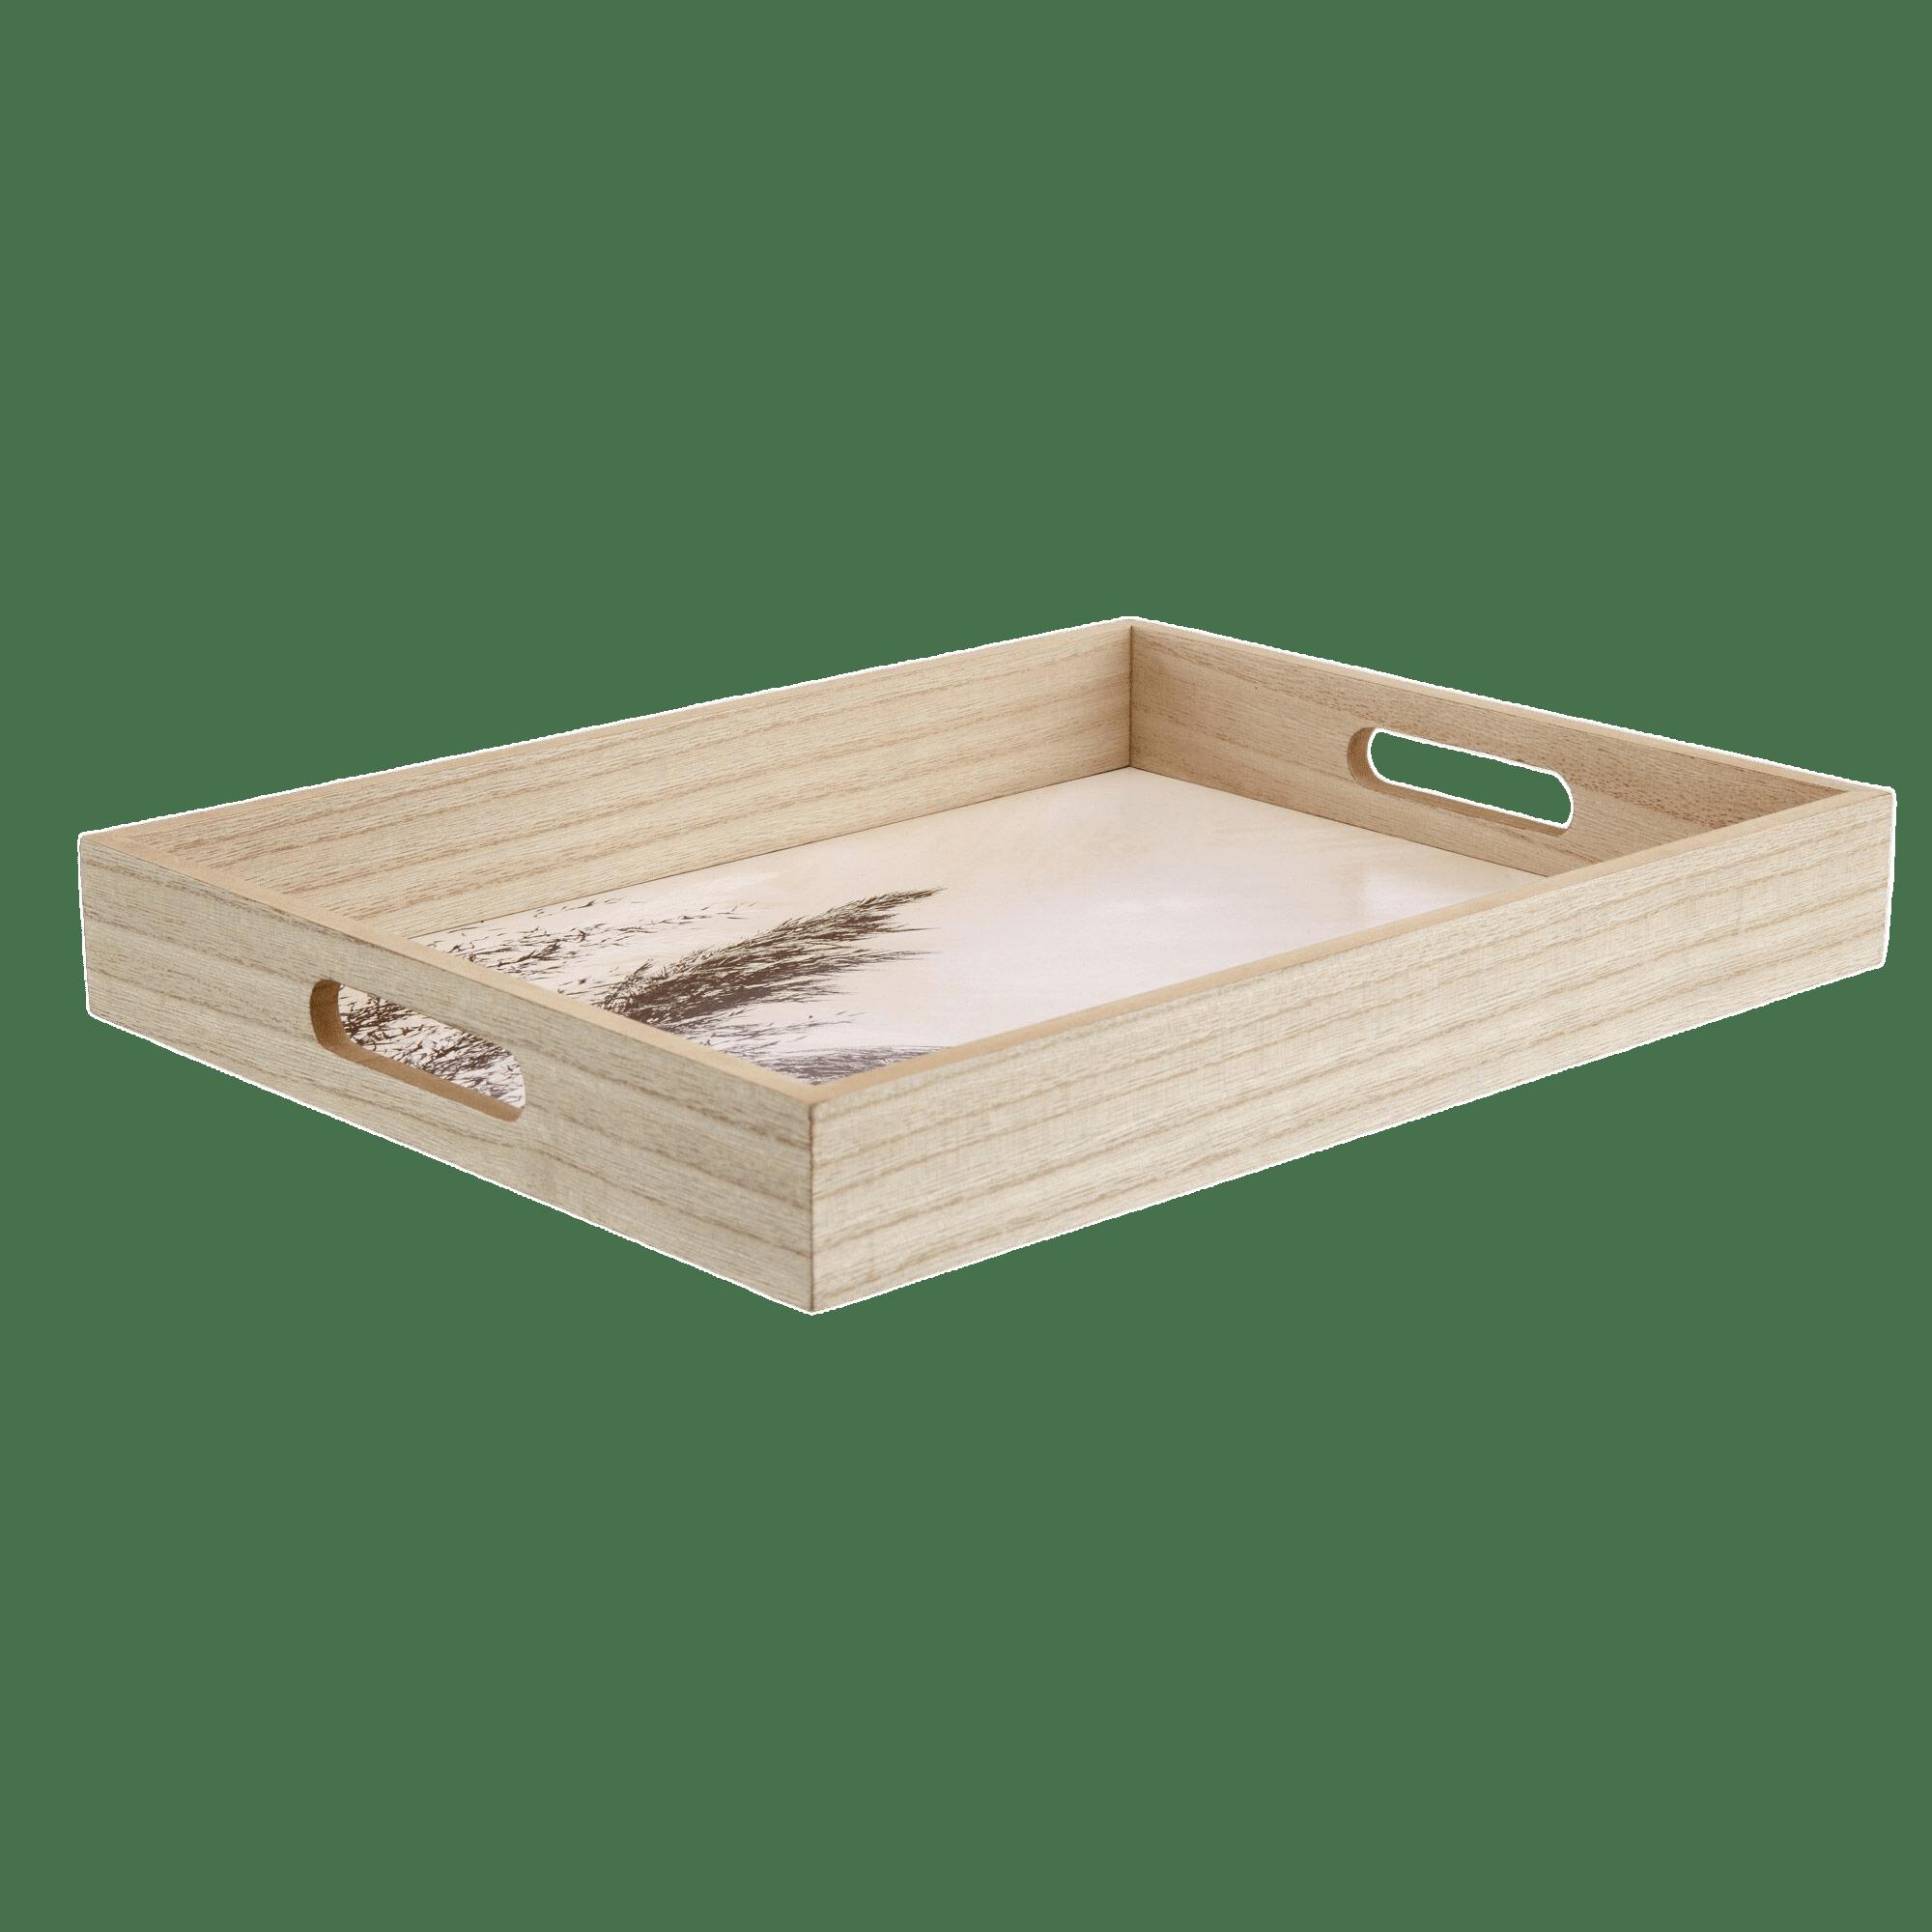 Rectangular Natural Wood Tray